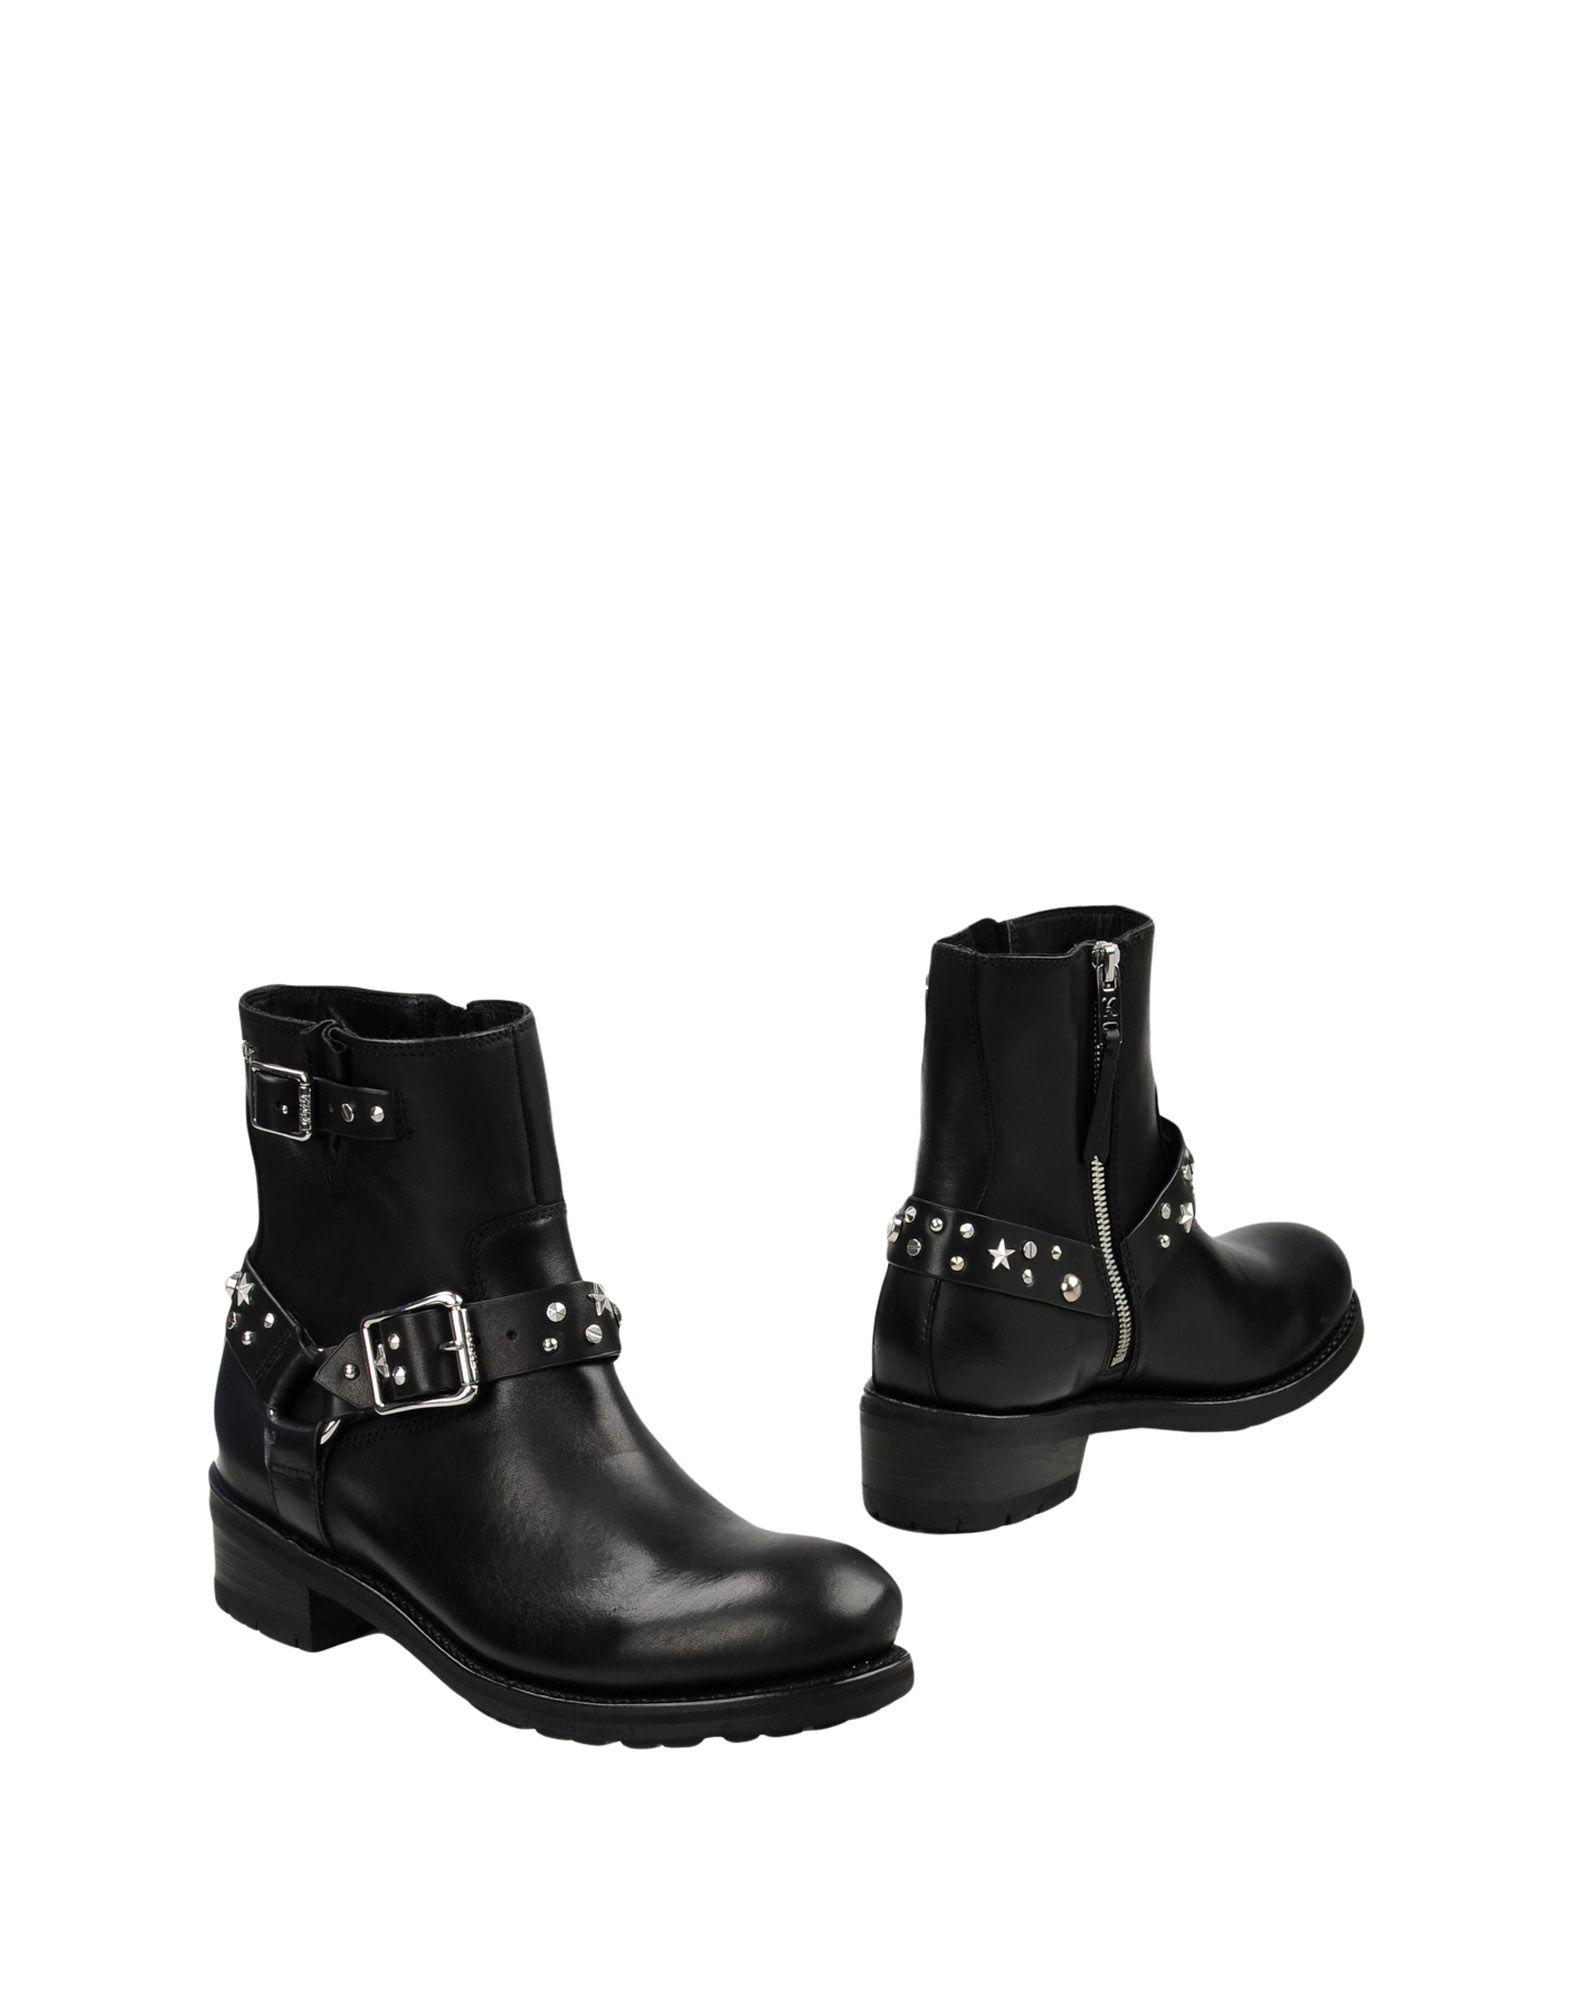 KARL LAGERFELD   KARL LAGERFELD Ankle boots 11423782   Goxip